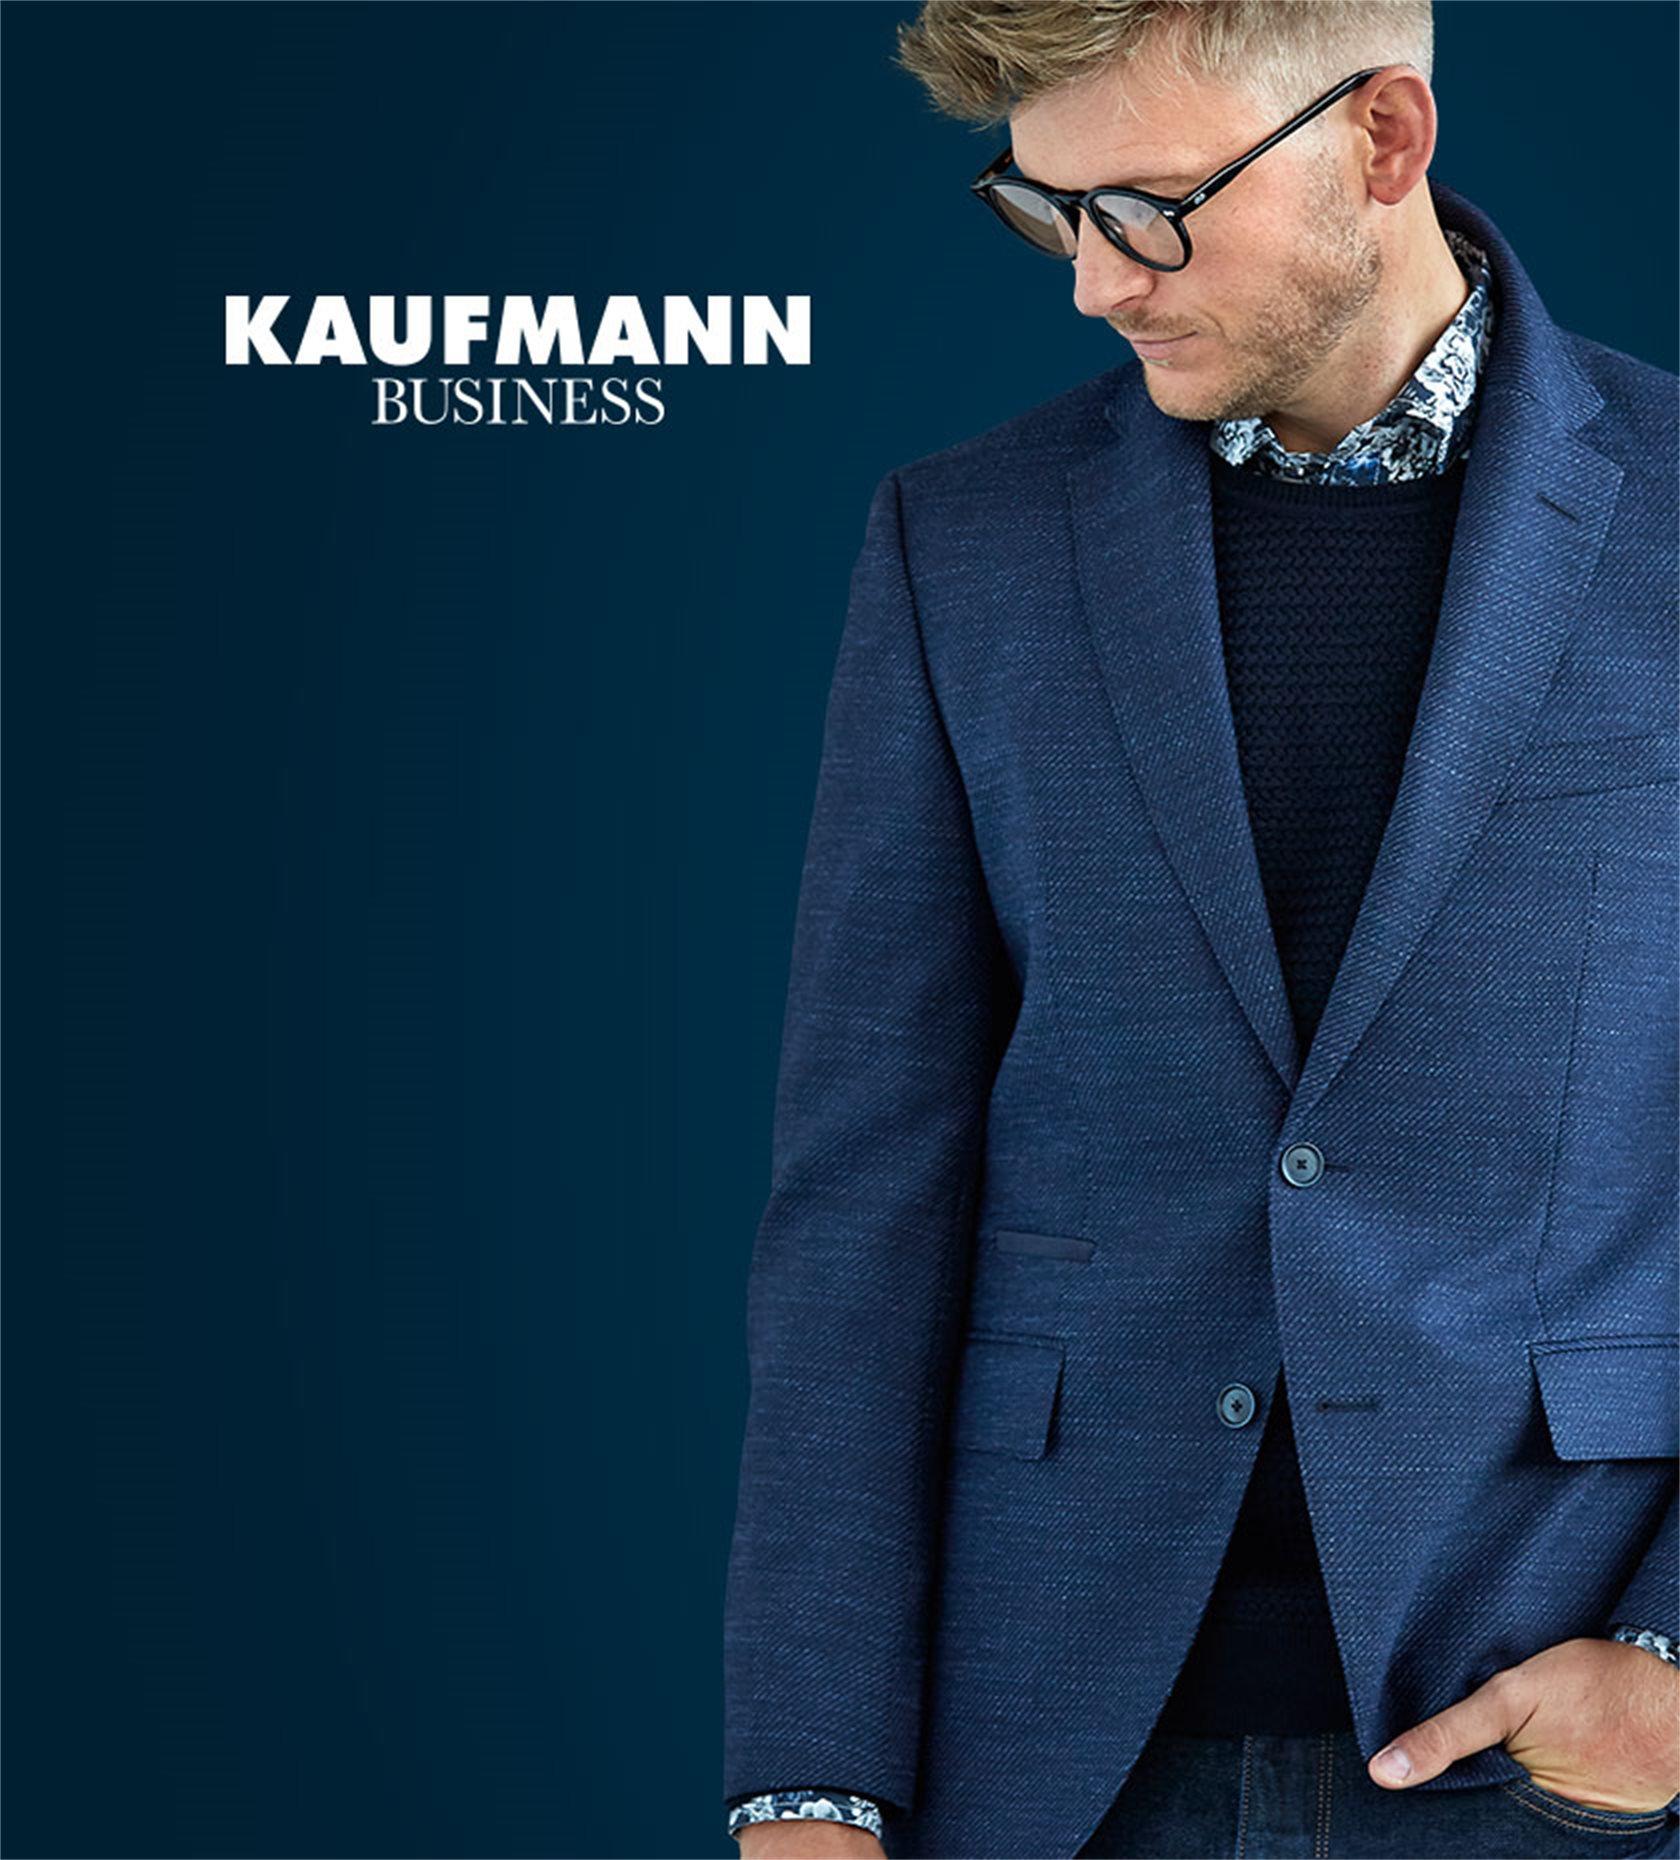 Kaufmann Business